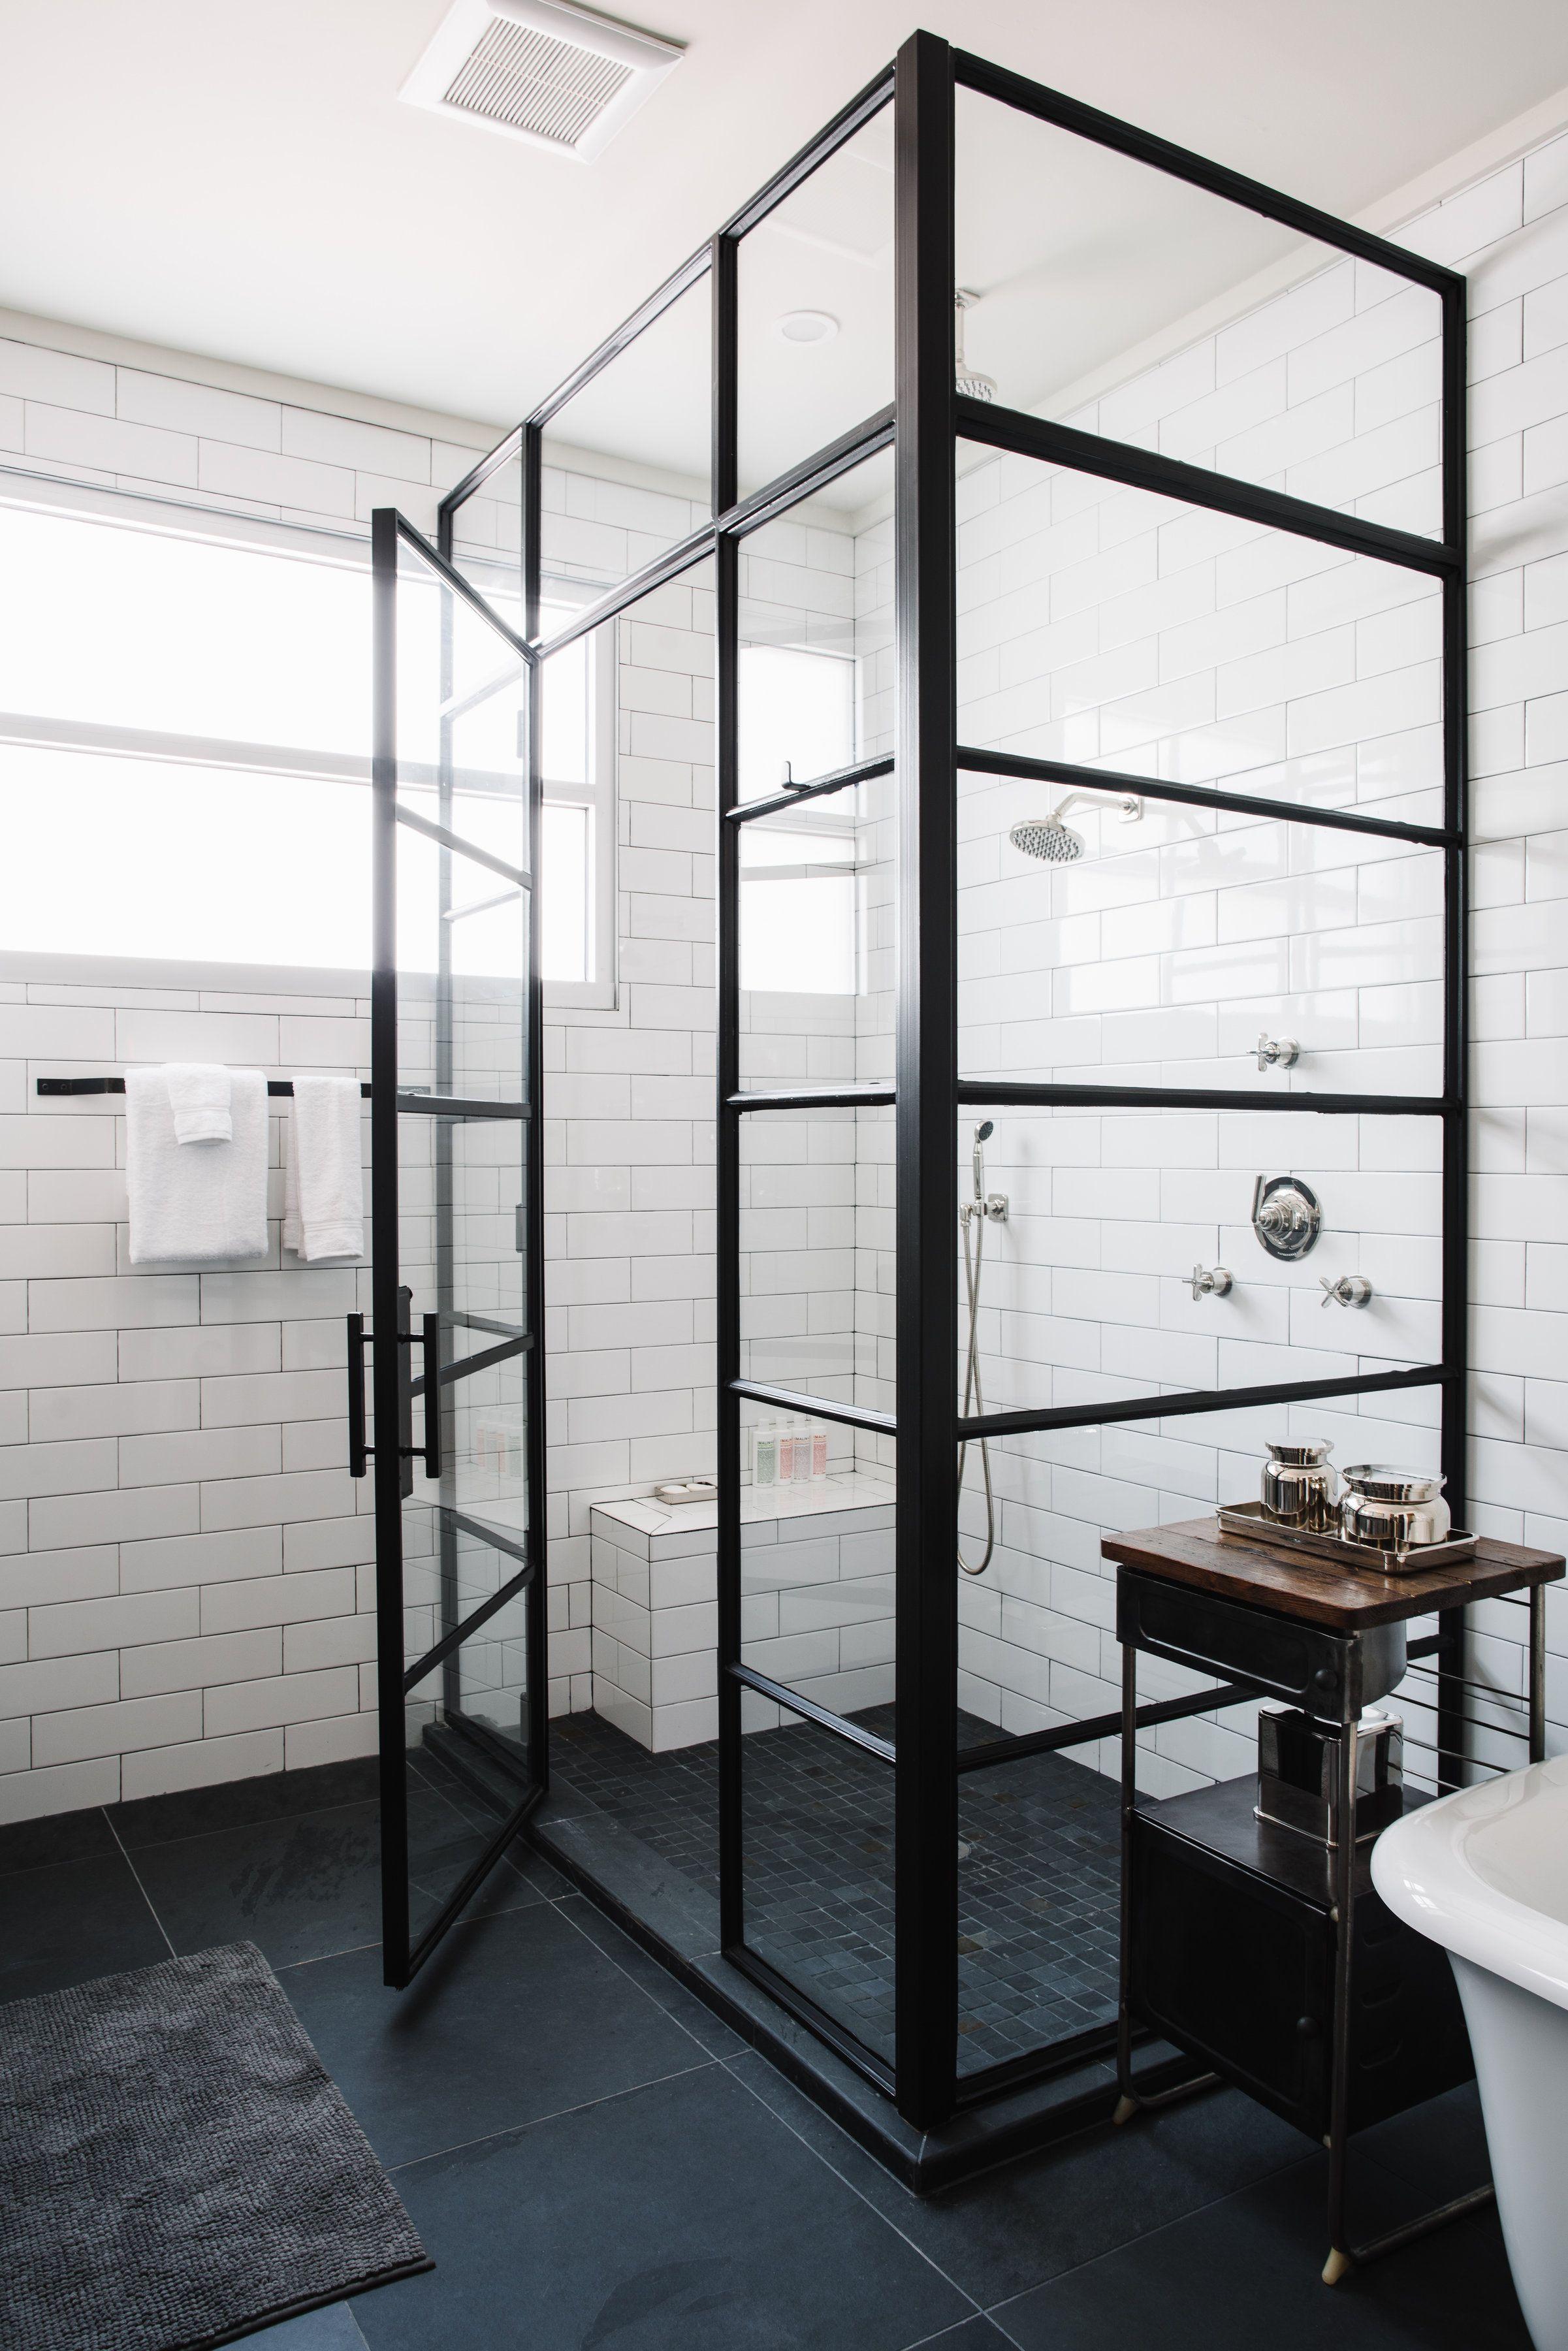 Simply Stunning Bathroom Design With Window Paneled Shower Doors